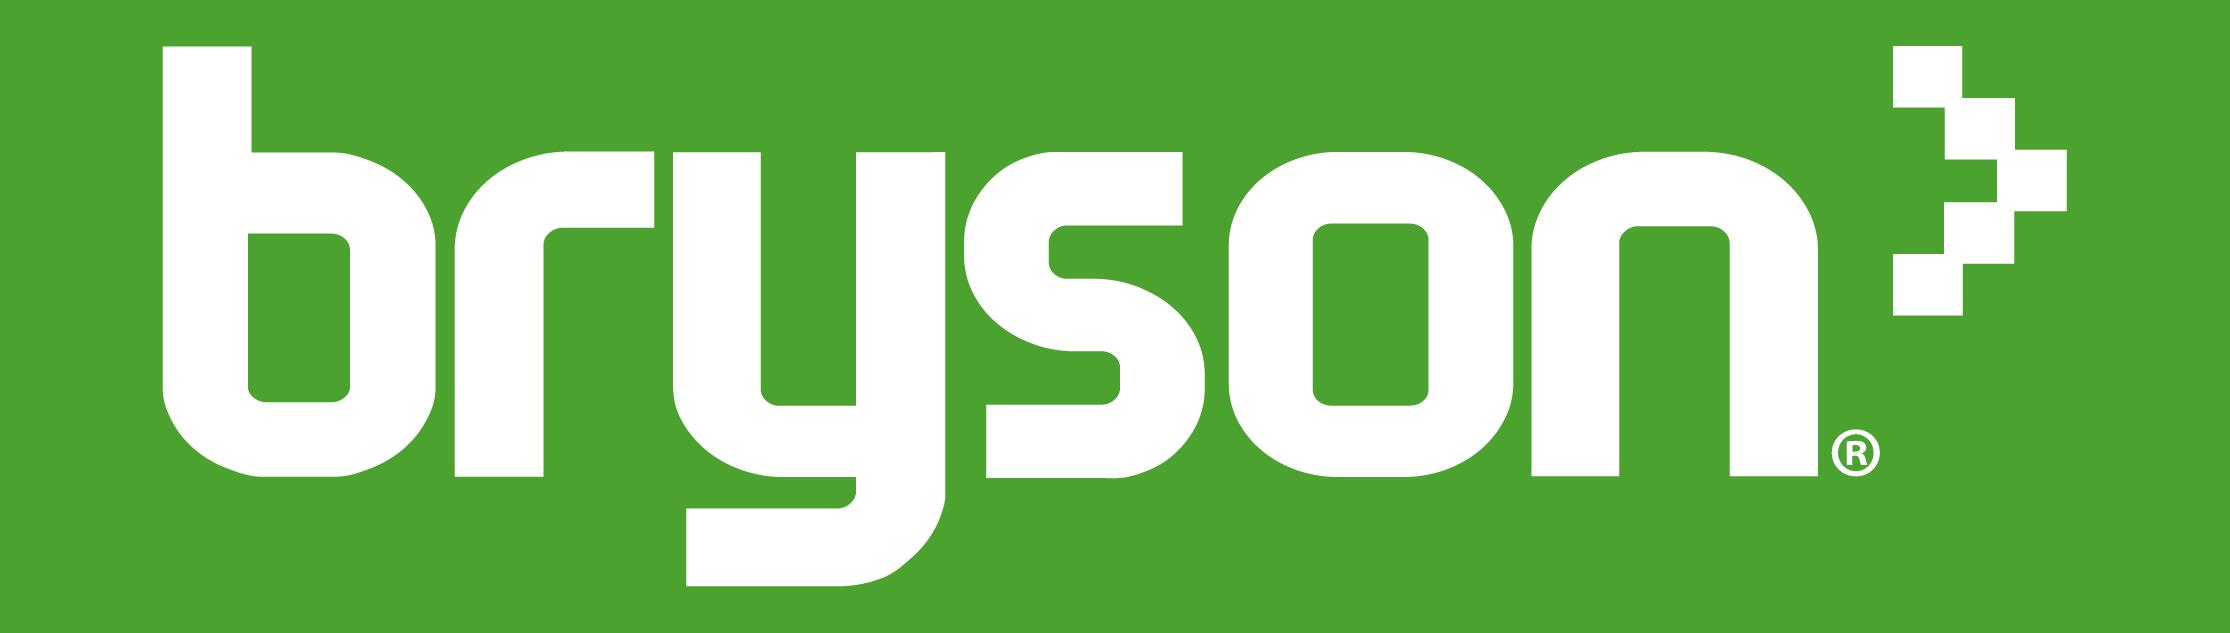 Bryson Logo 1